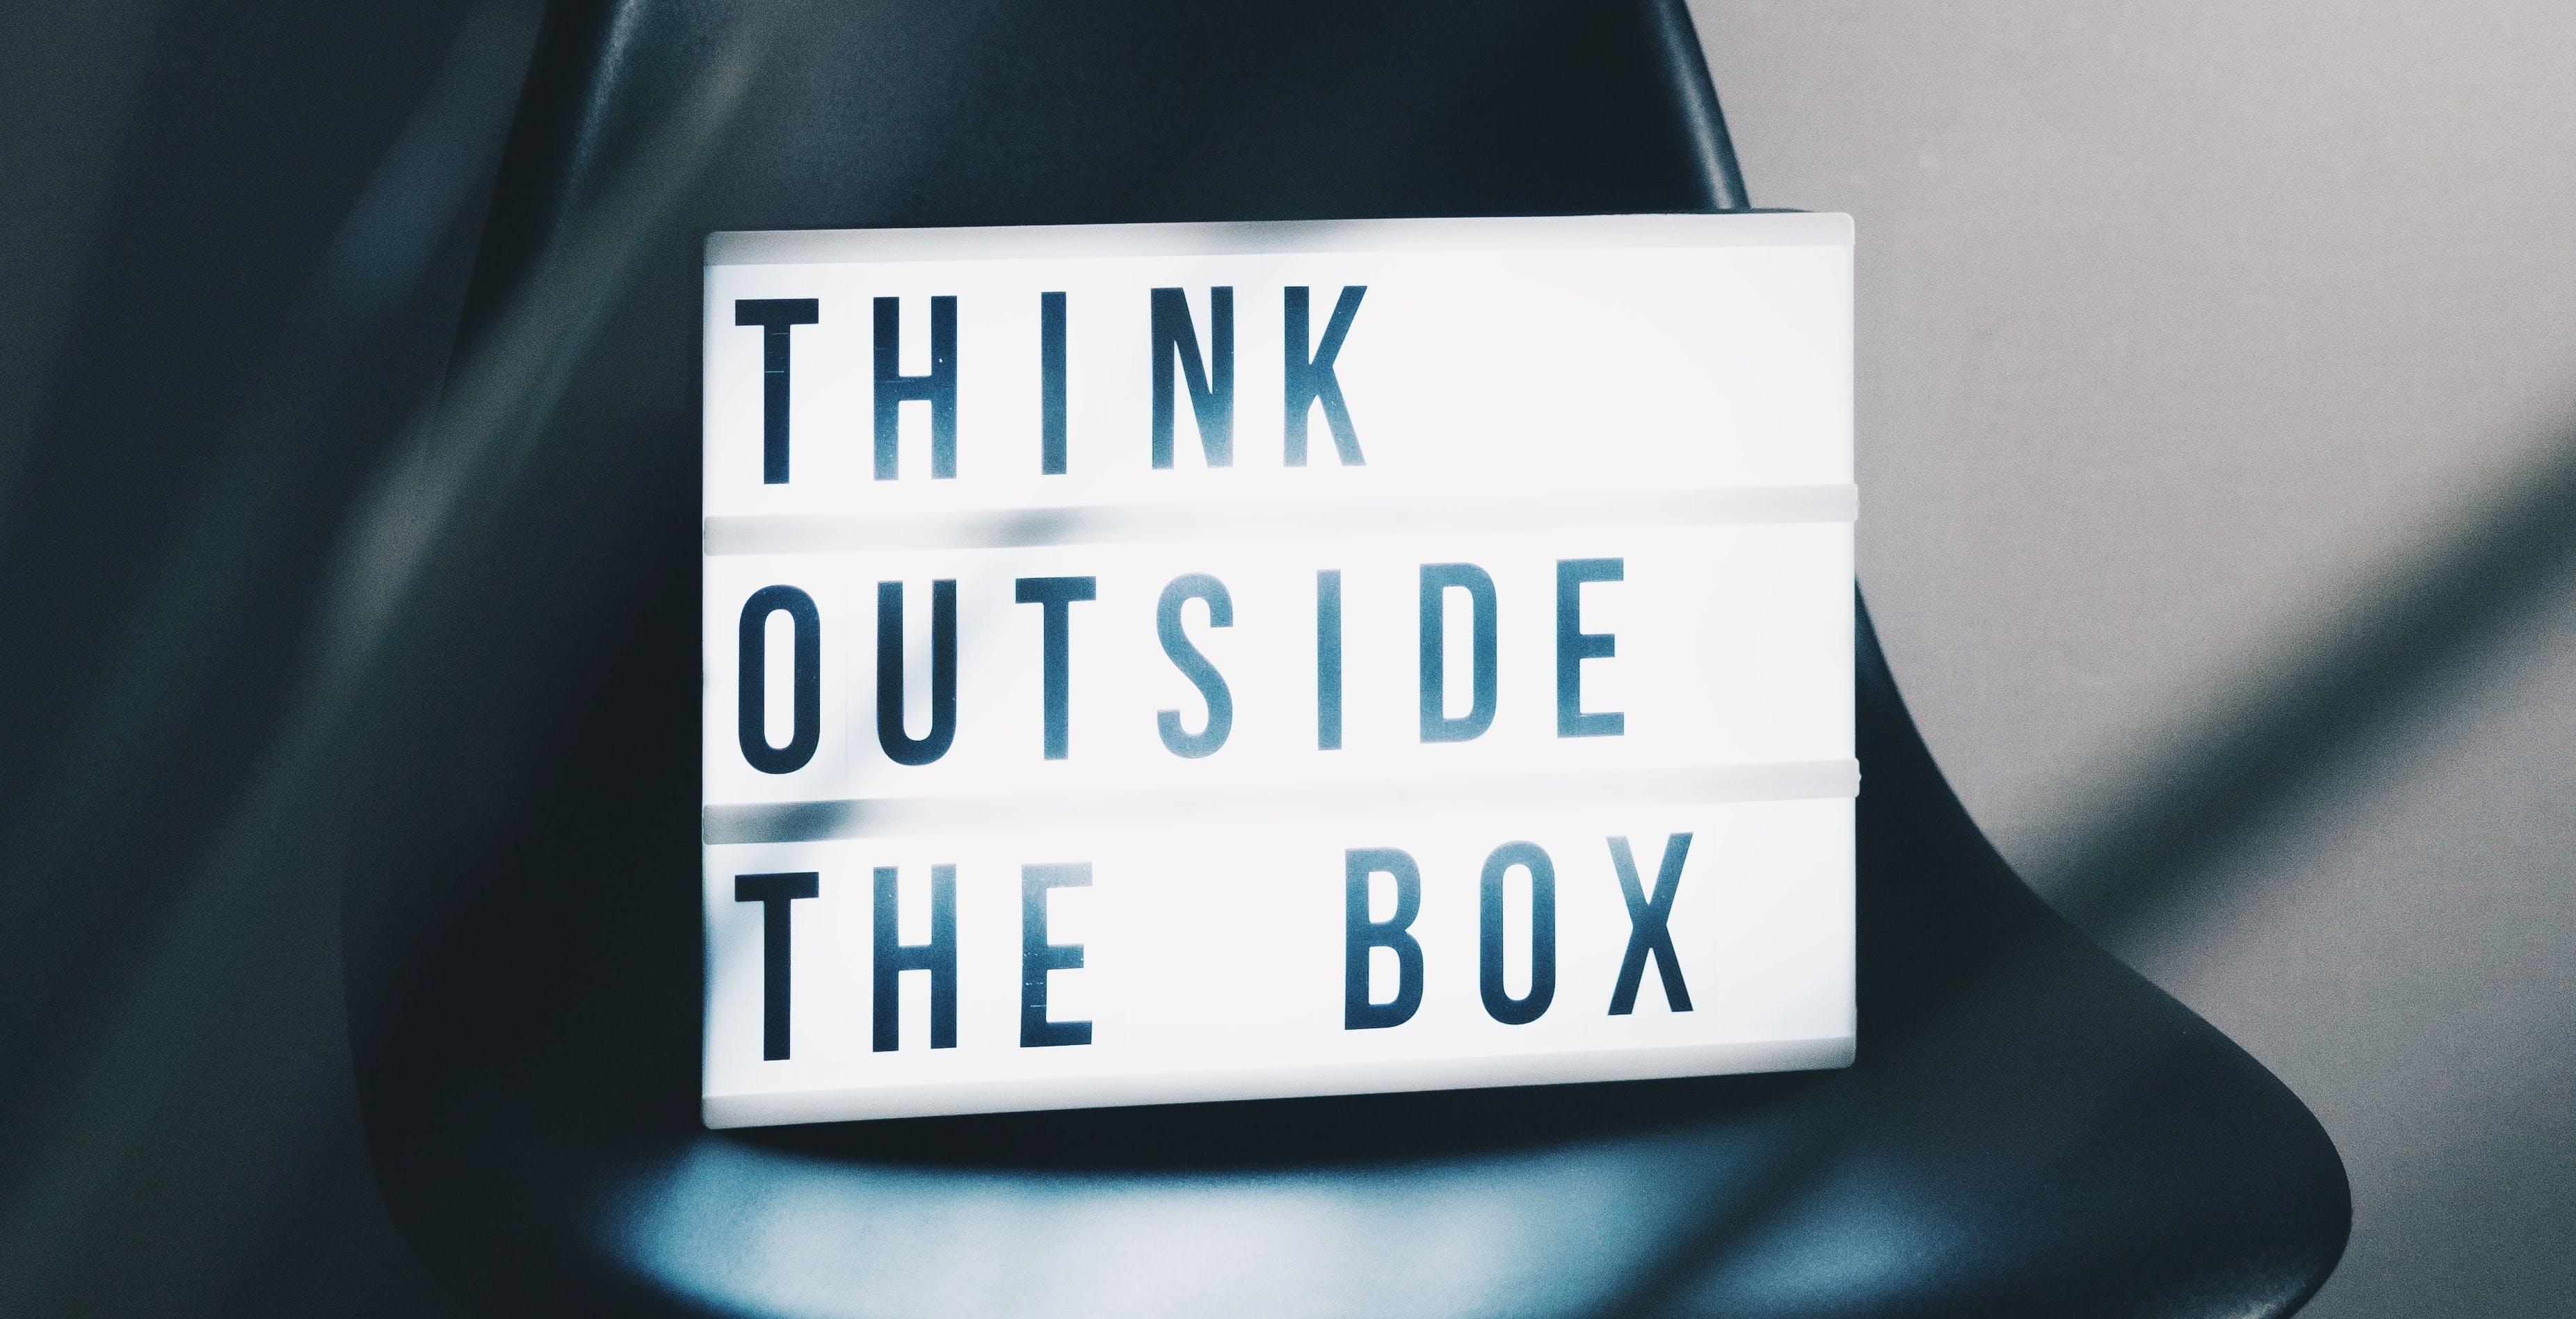 thinkoutofbox.jpg